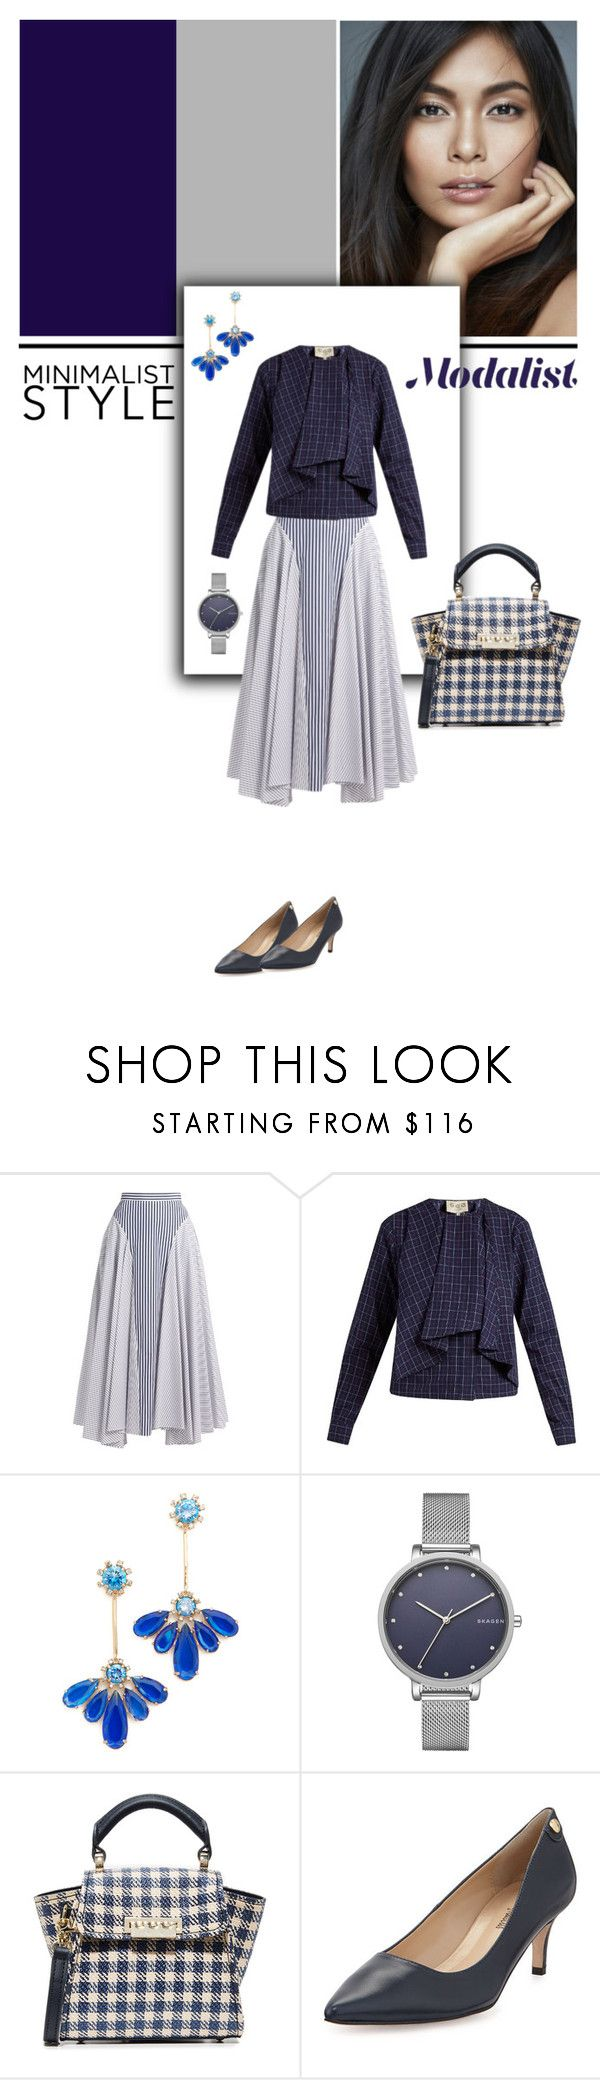 """Fashion and Fun in Handkerchief Hem Skirt"" by modalist ❤ liked on Polyvore featuring ADAM, Sea, New York, Kate Spade, Skagen, ZAC Zac Posen and Neiman Marcus"